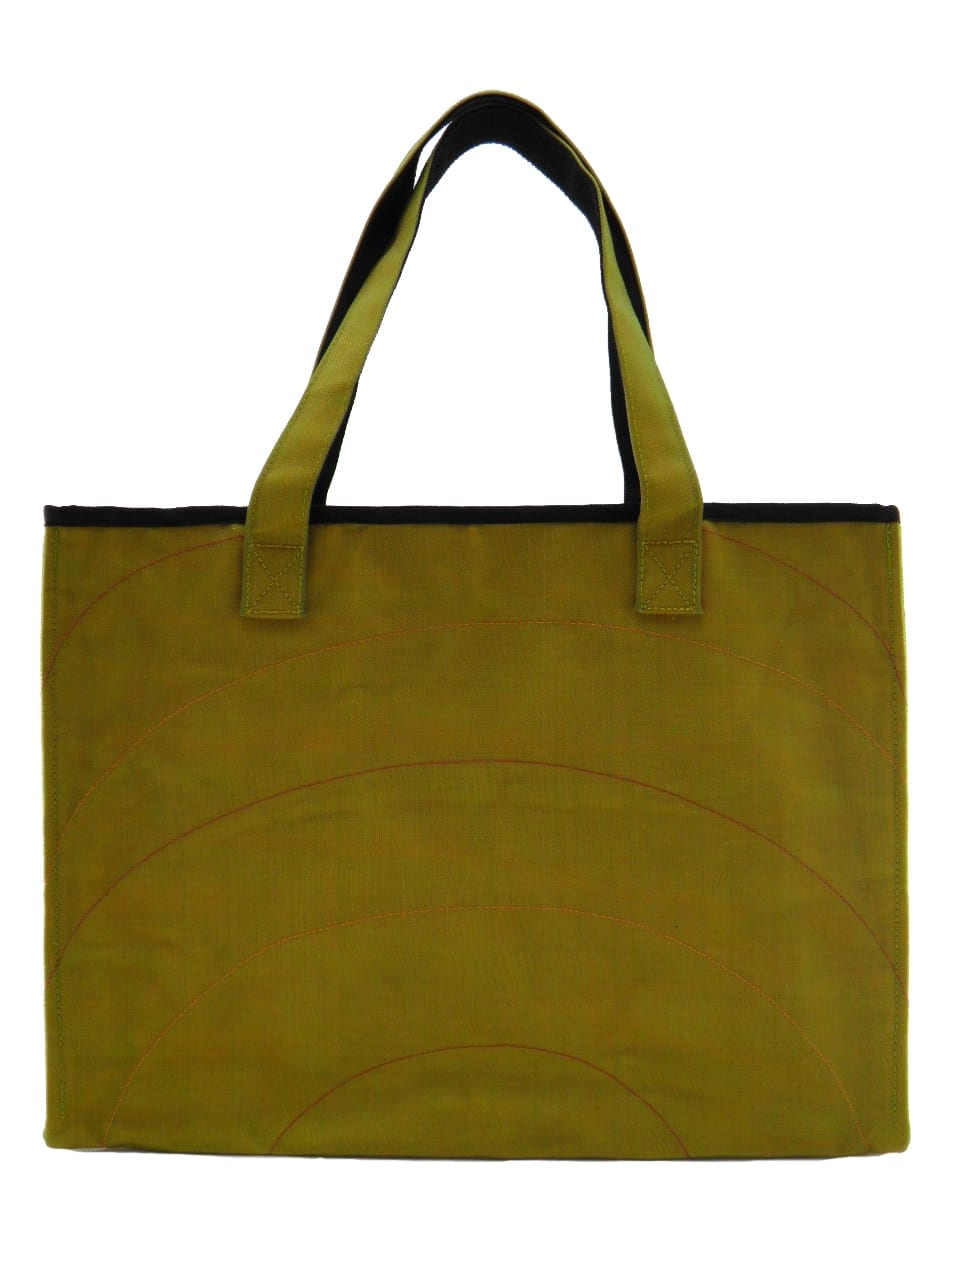 Random Admin - Tote bag - Yellow - verso